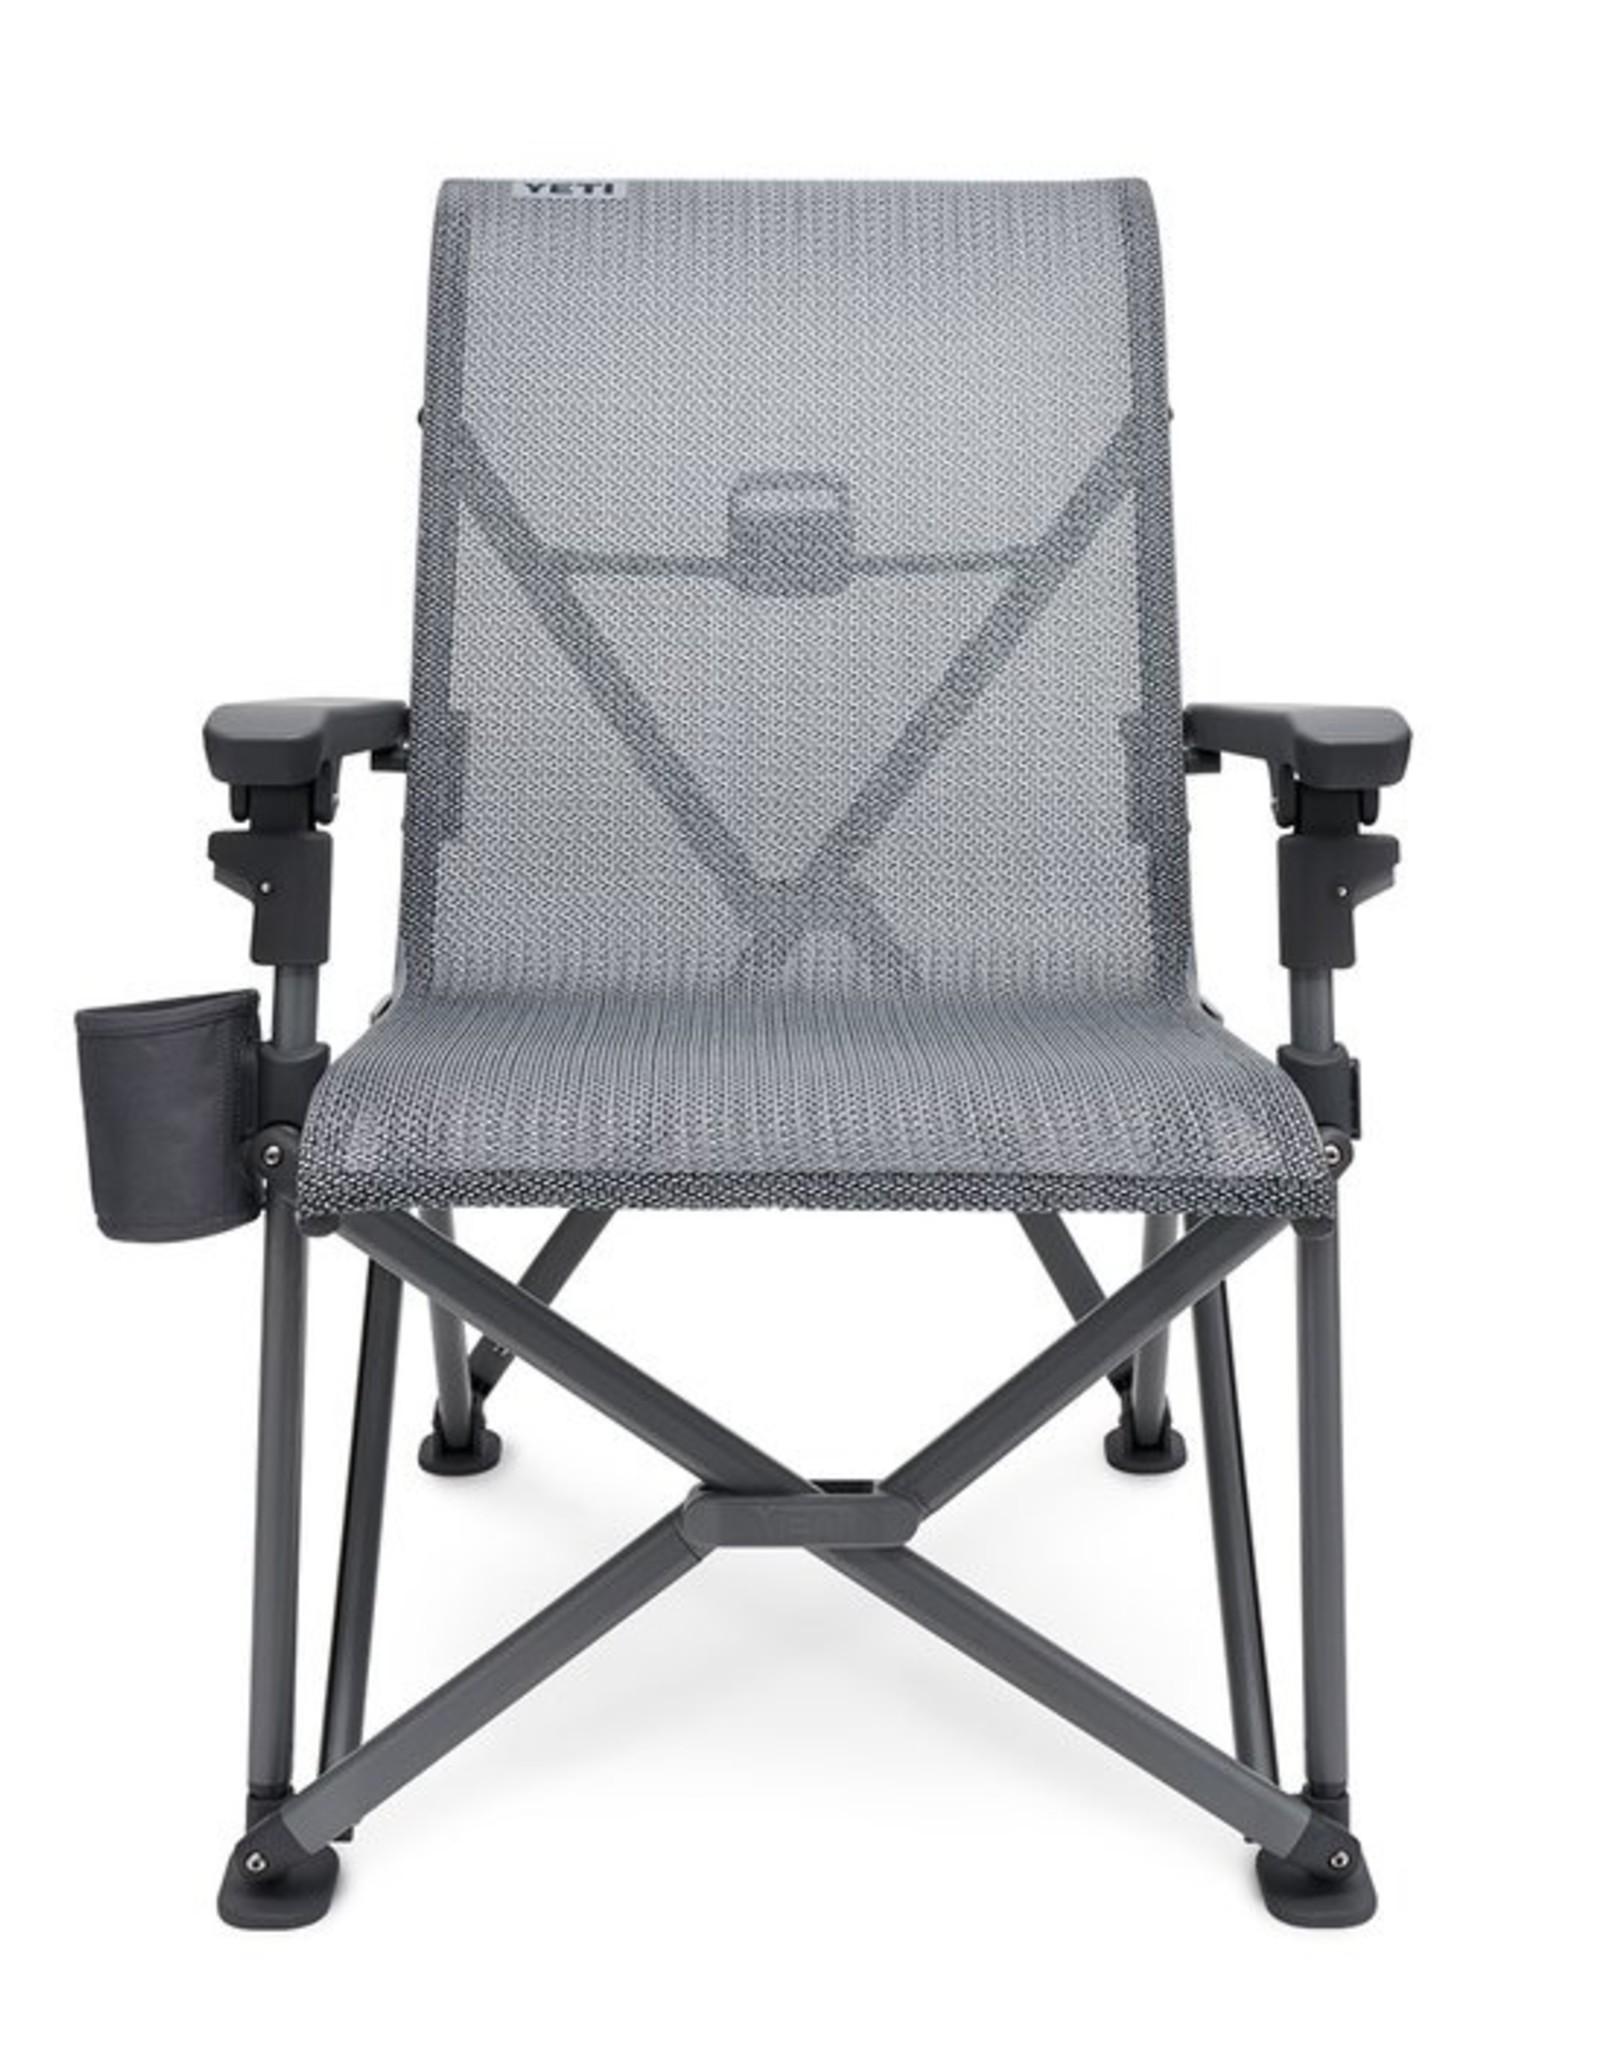 YETI Coolers Trailhead Camp Chair-Charcoal